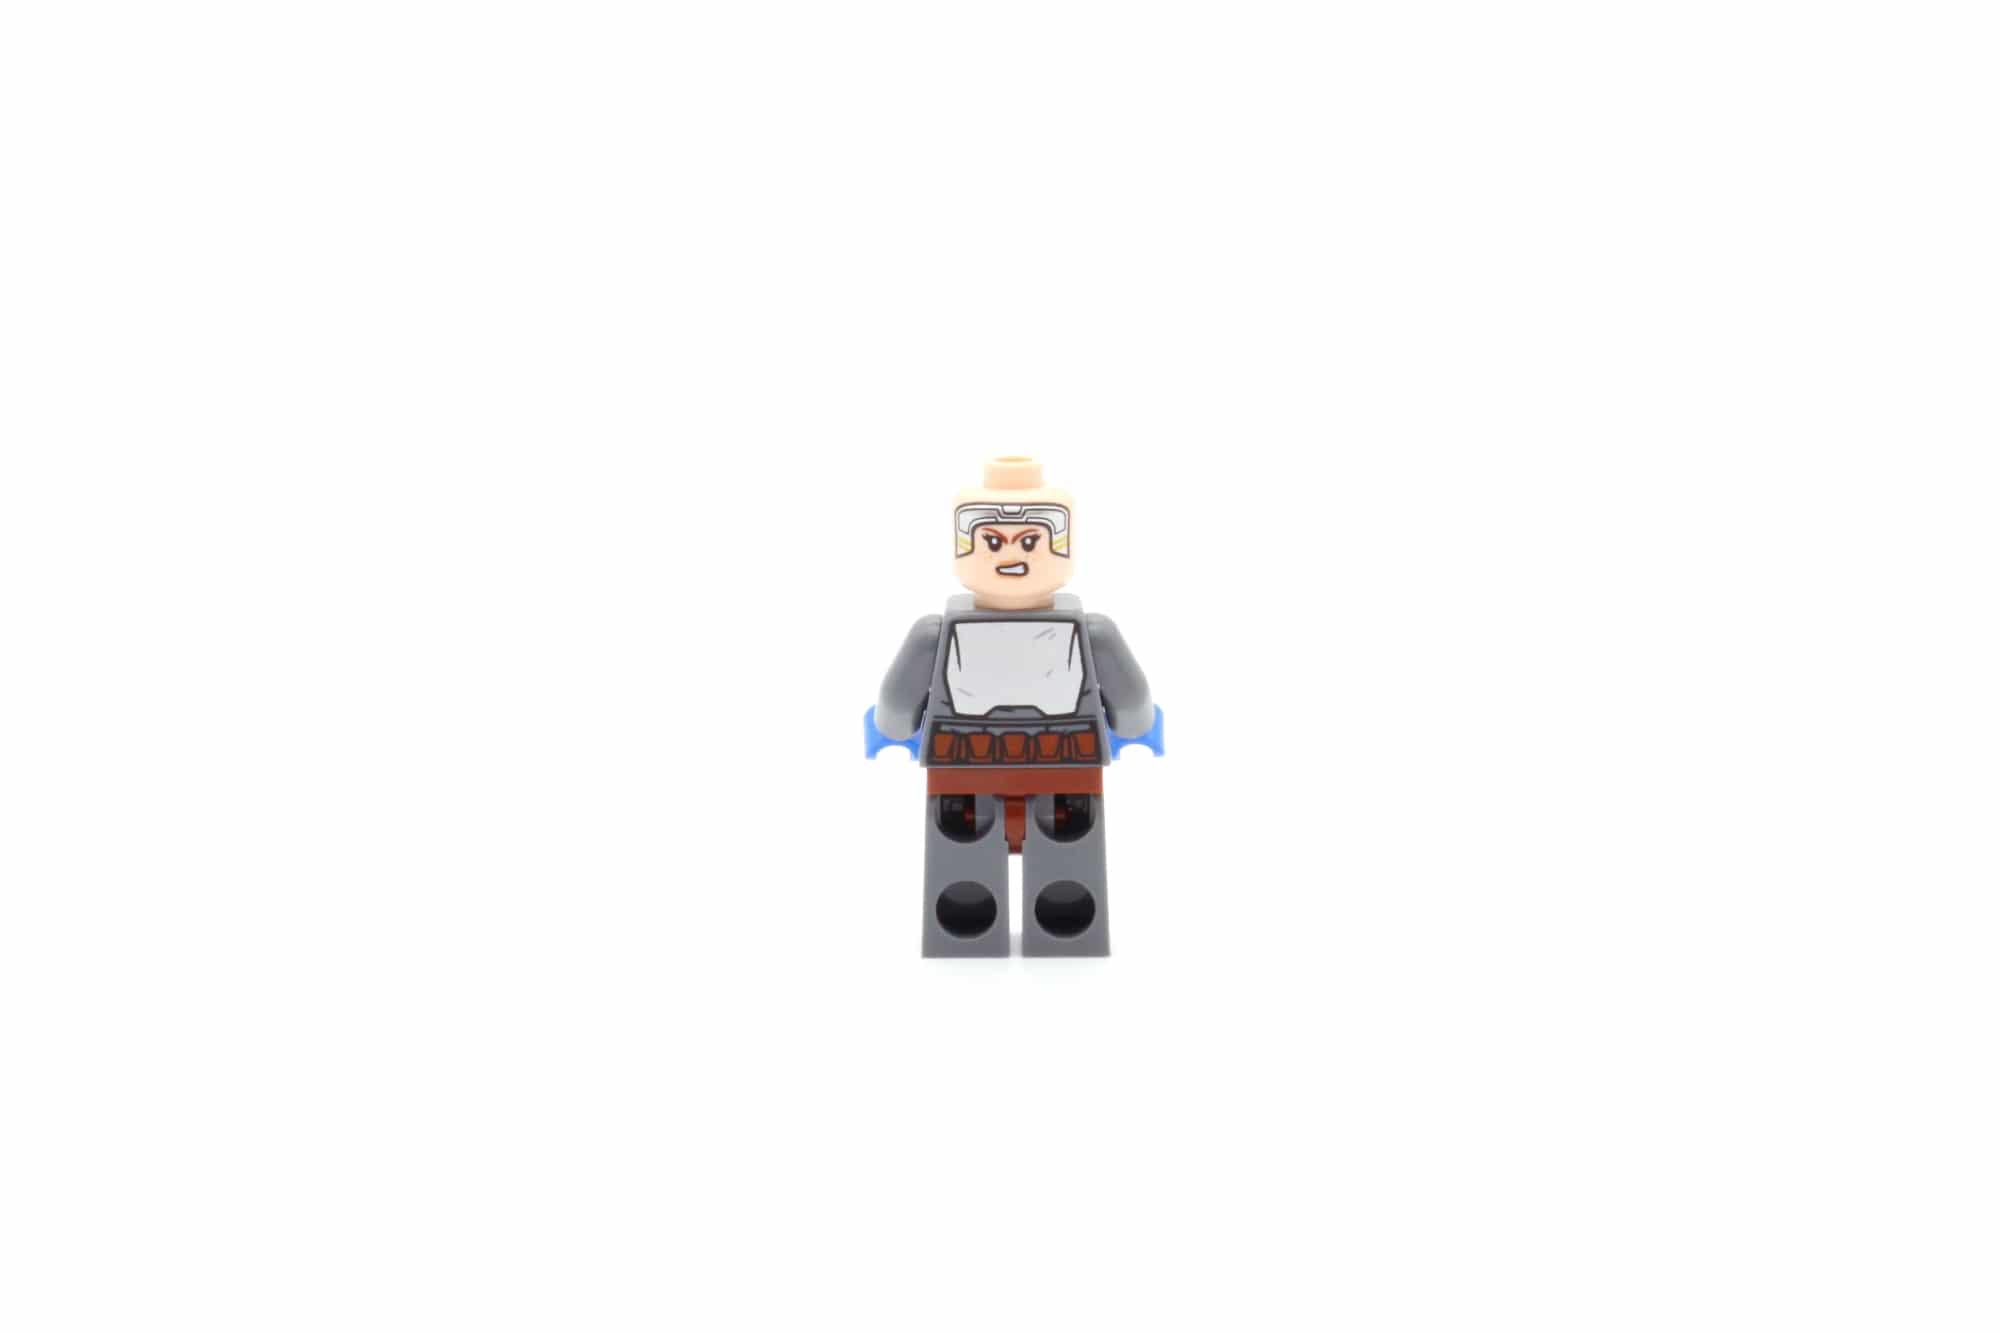 LEGO Star Wars 75316 Mandalorian Starfighter 6